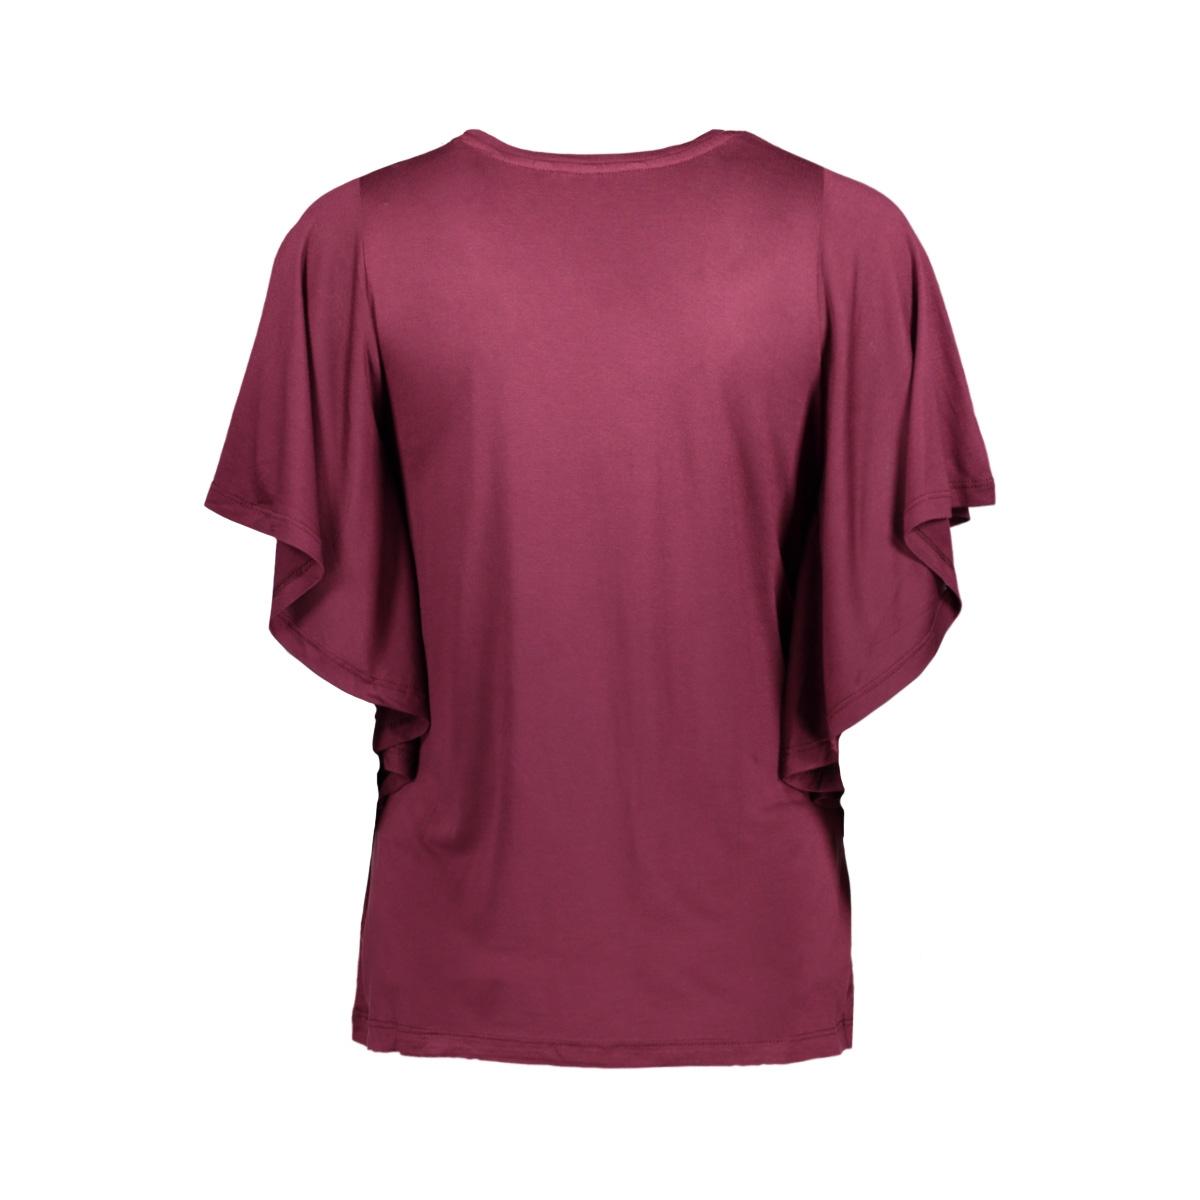 vmirfi s/s top sb8 10193608 vero moda t-shirt port royale